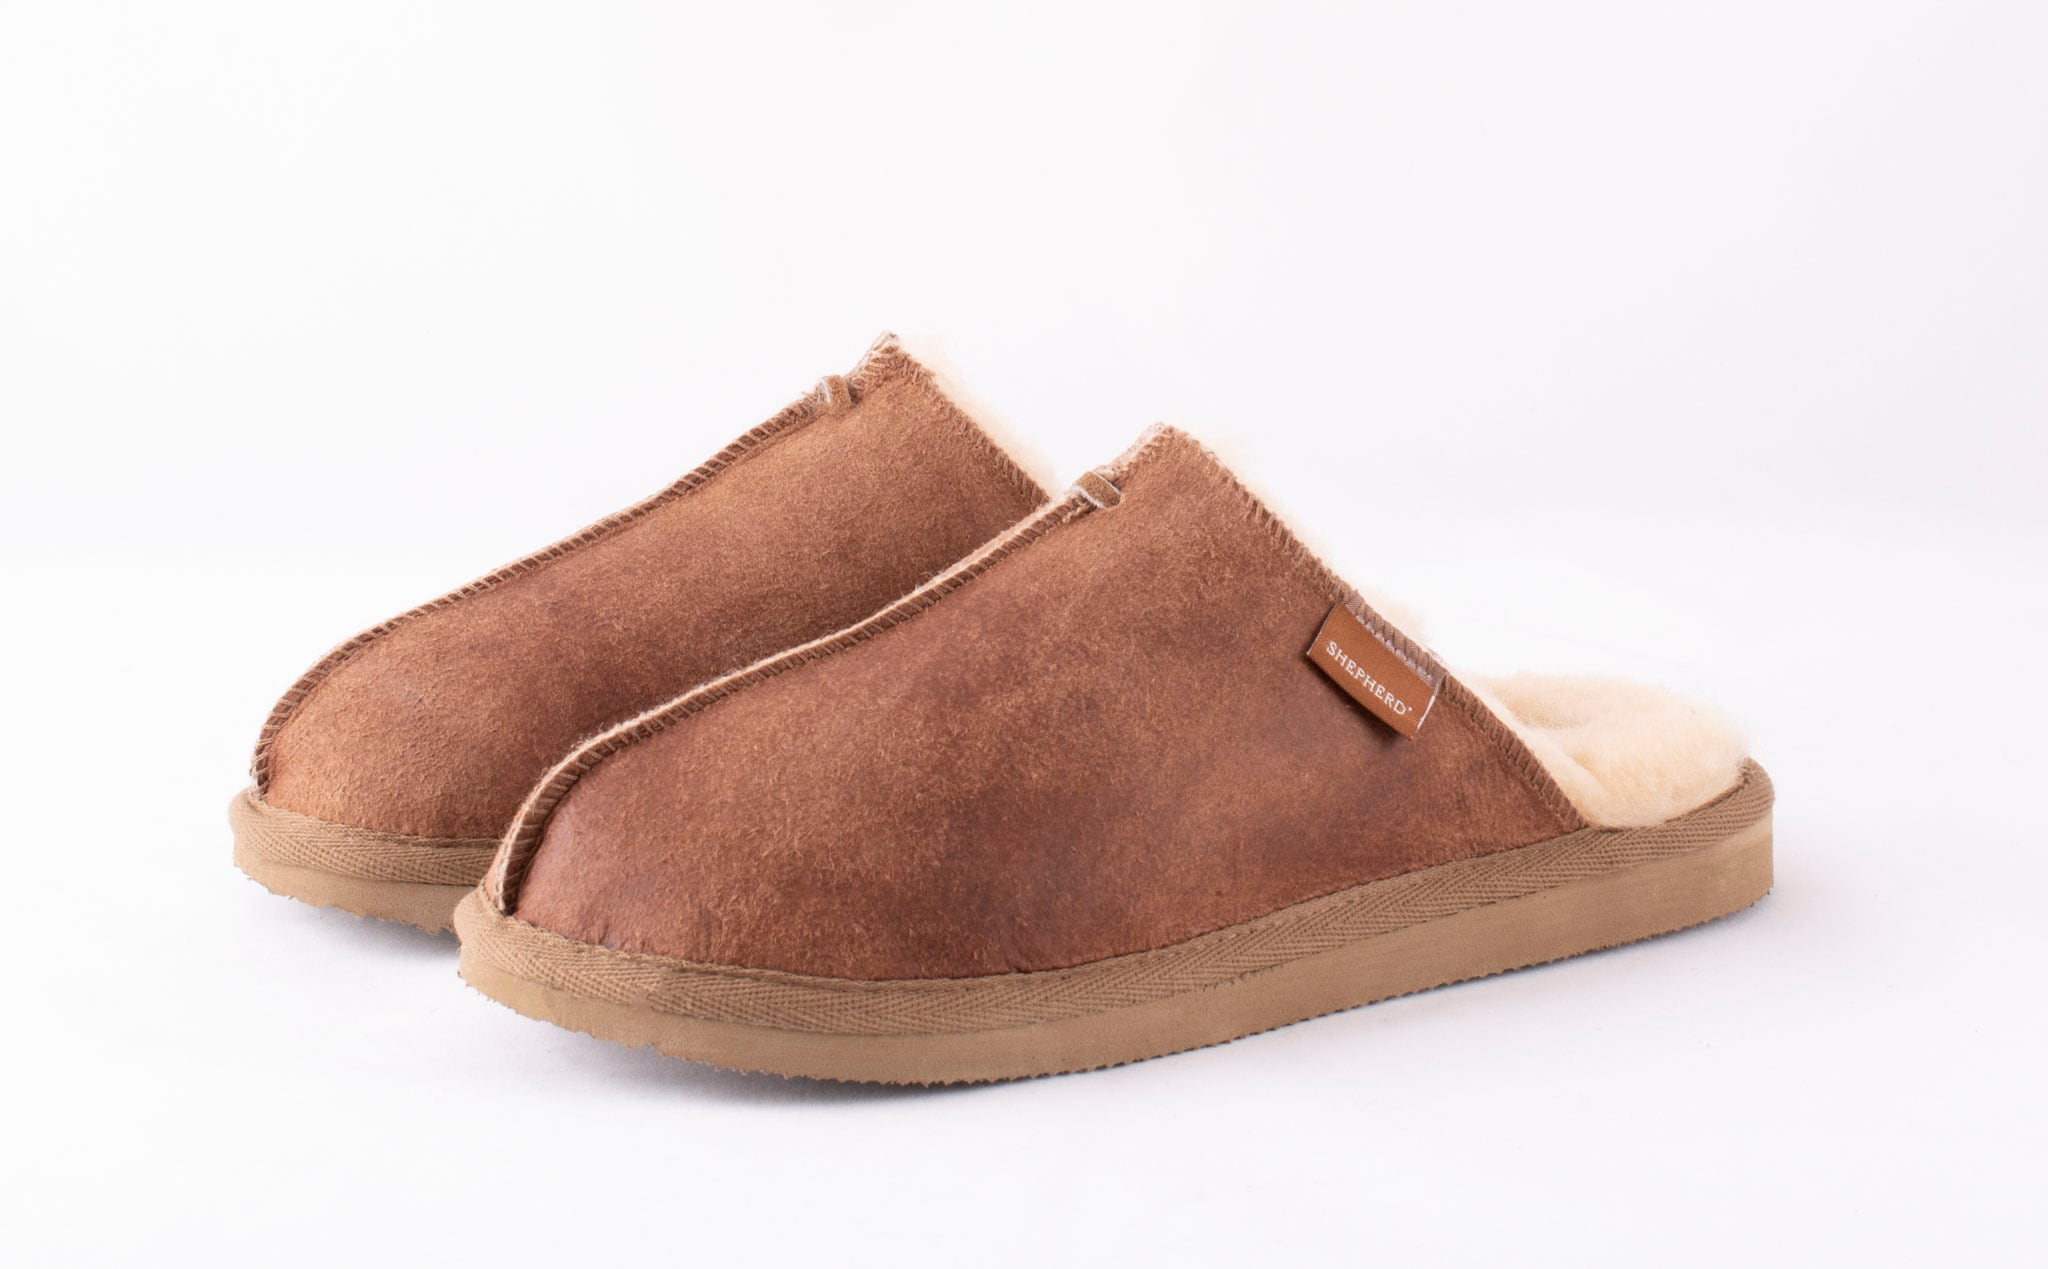 Shepherd Hugo slippers